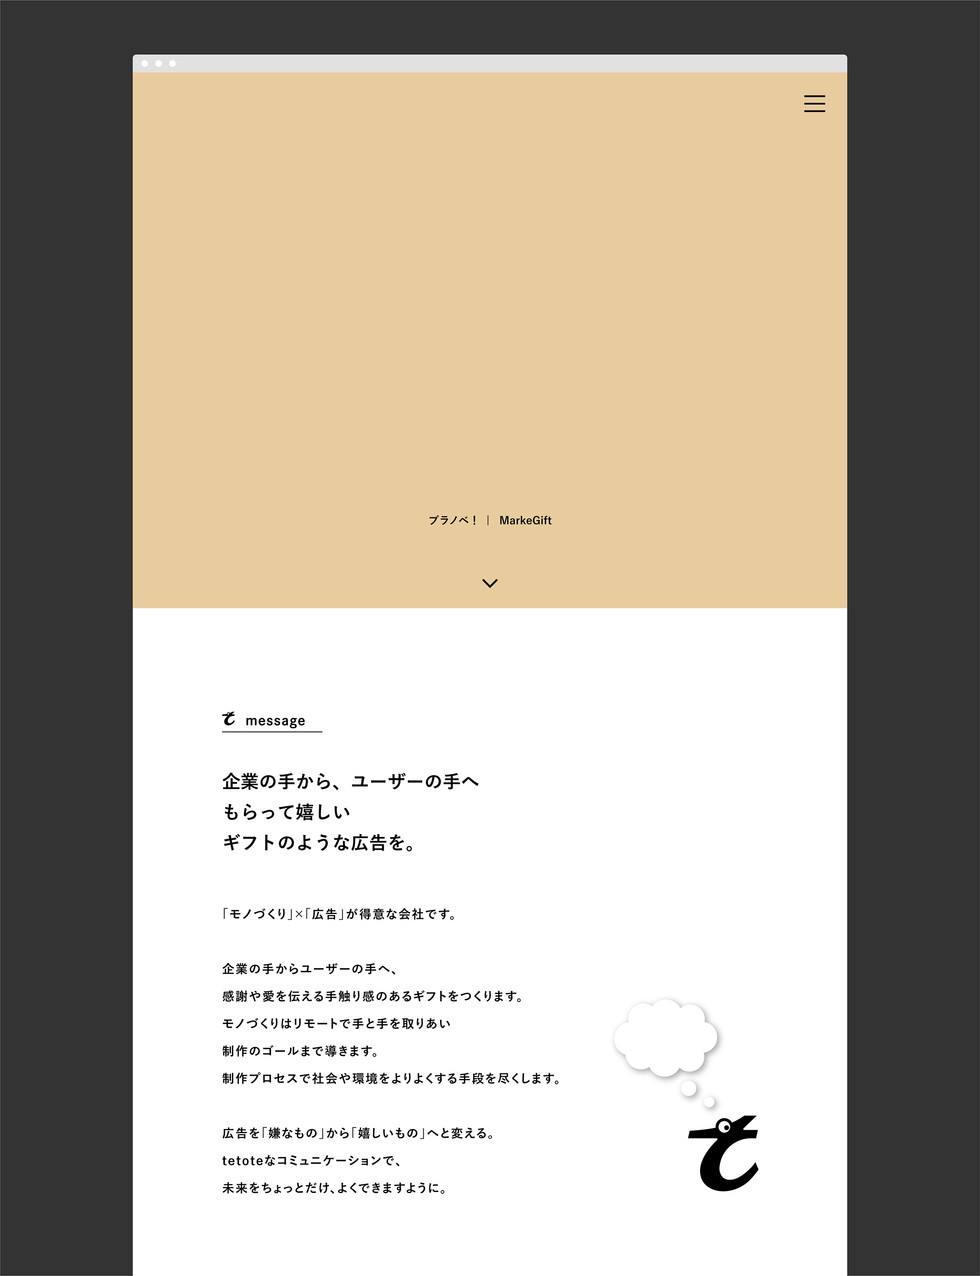 tetote_01_アートボード 1 のコピー 10.jpg